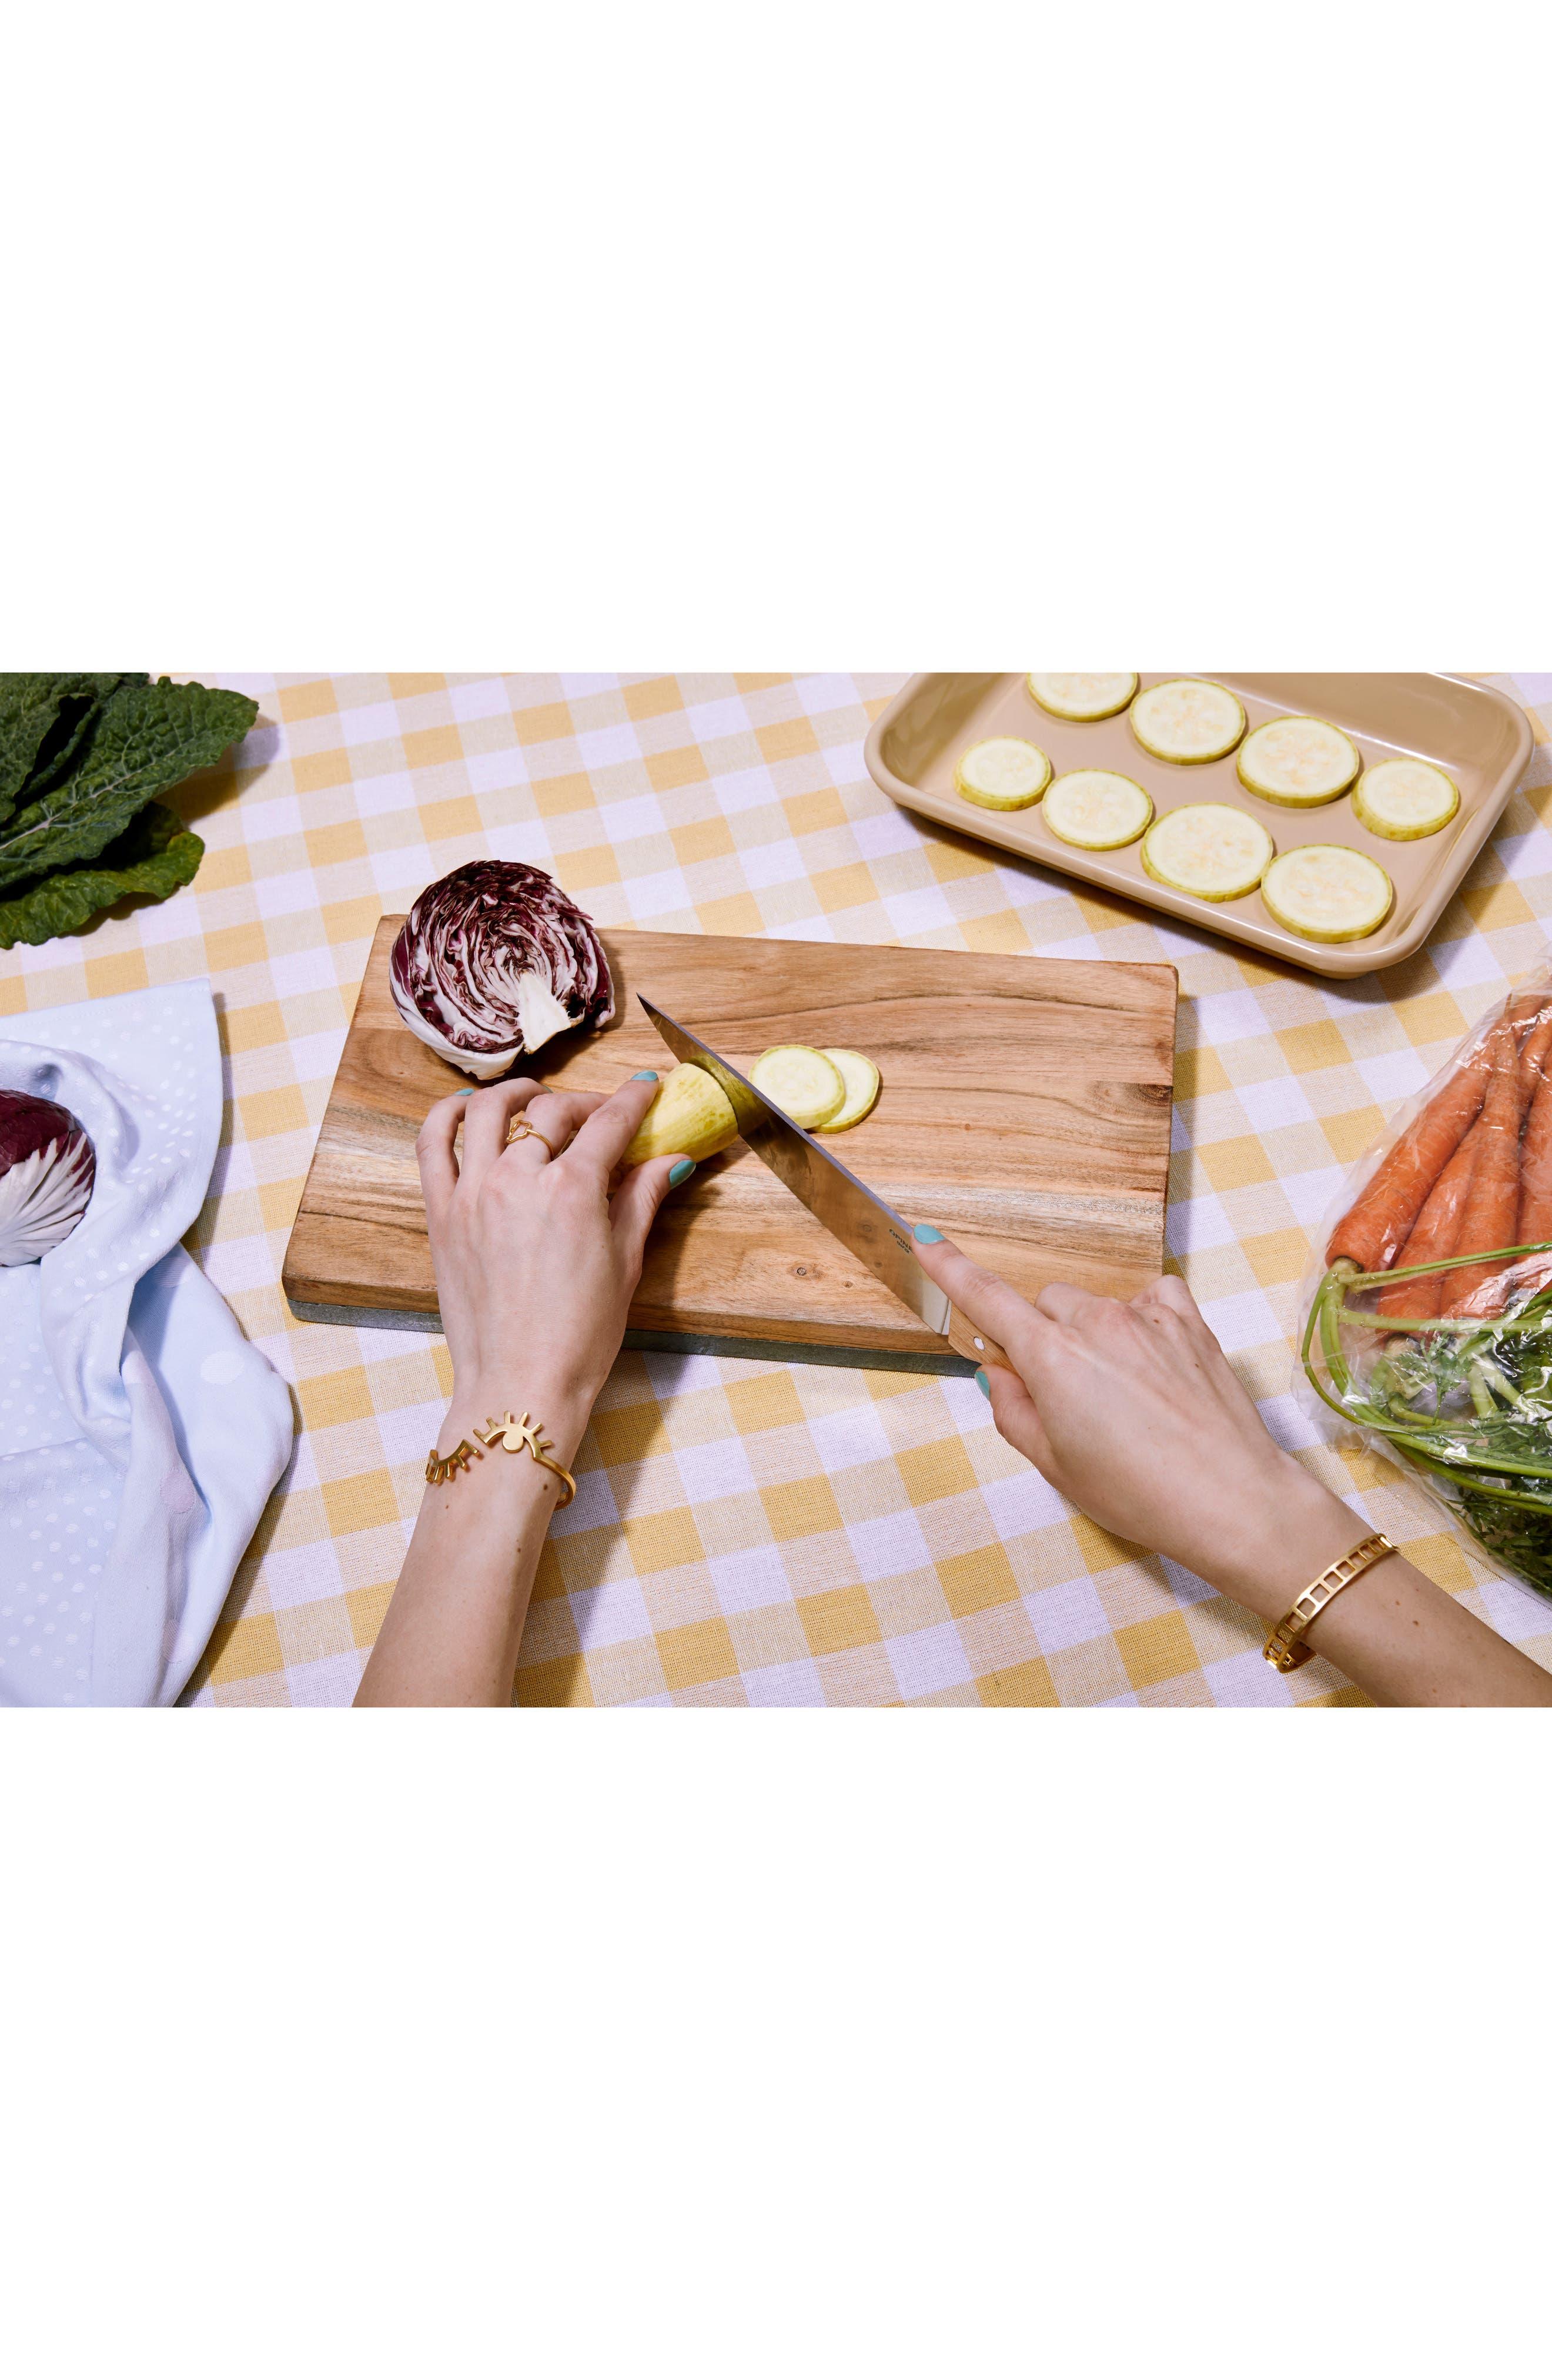 Blue Marble & Mango Wood Reversible Serving Board,                             Alternate thumbnail 2, color,                             Wood